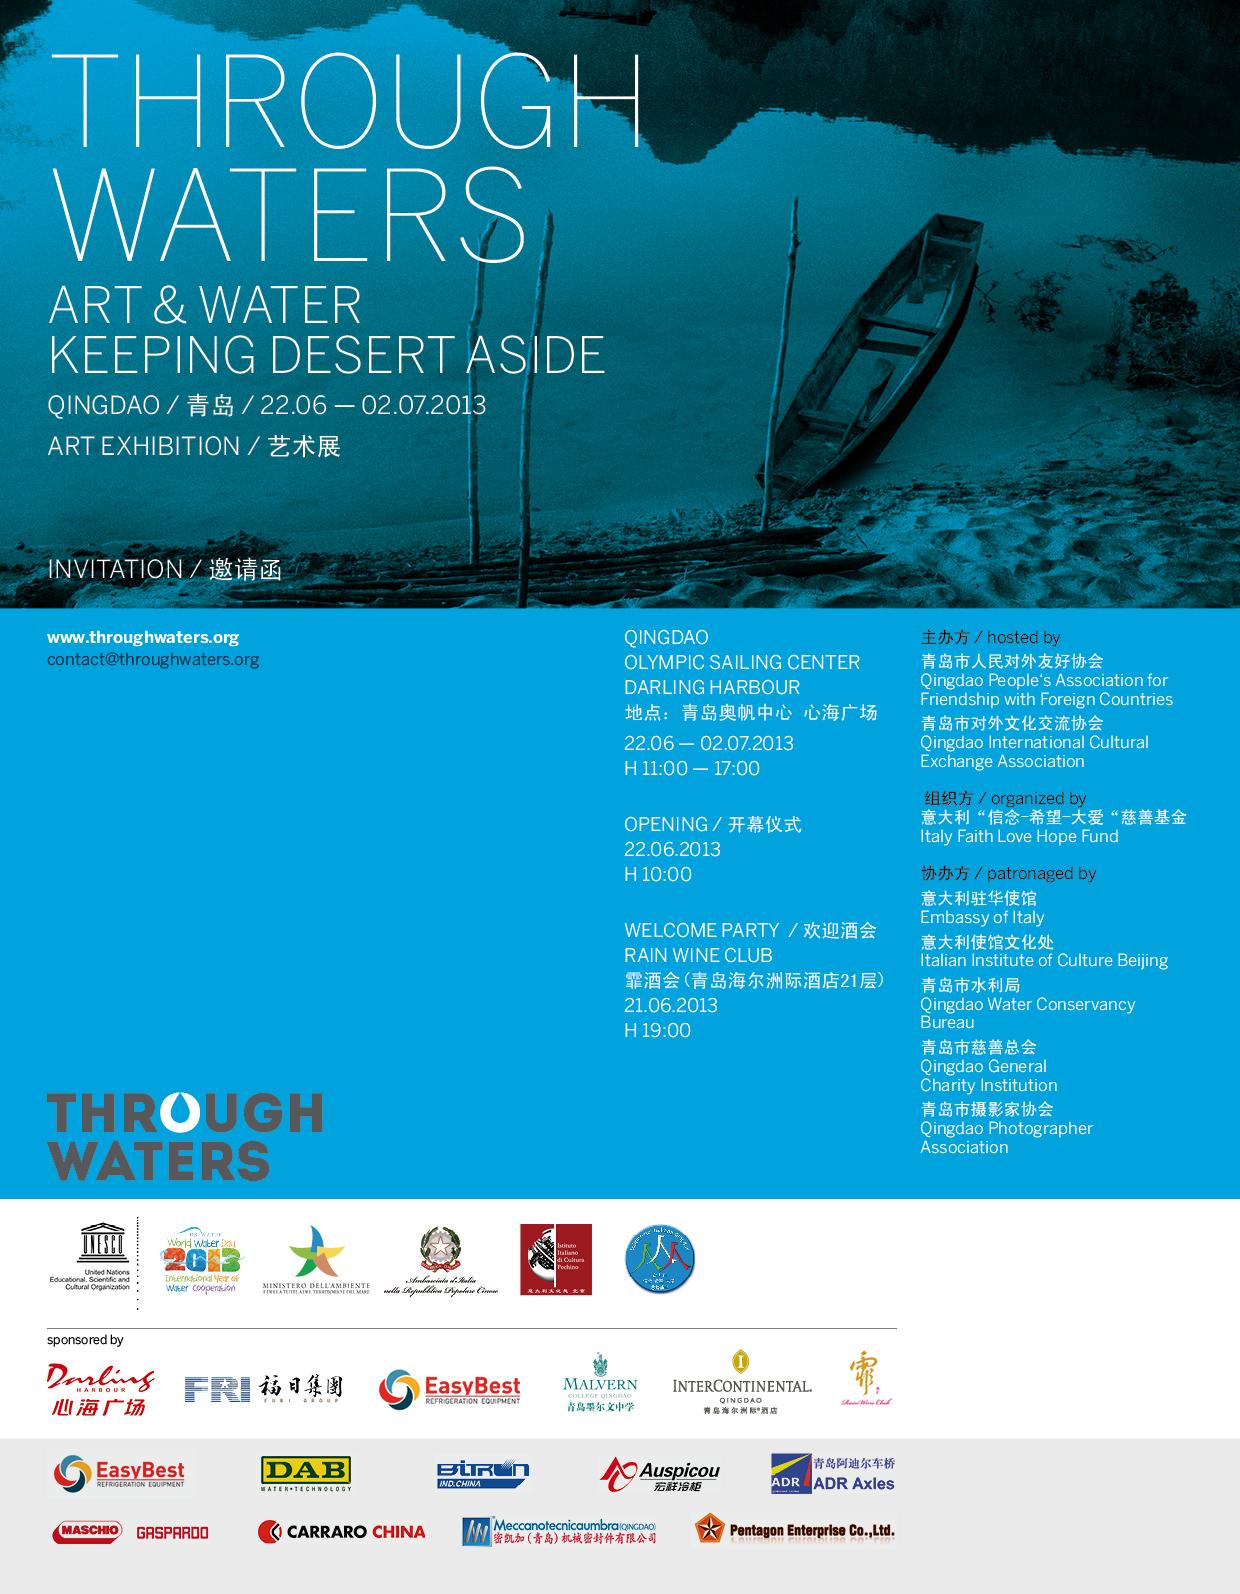 TW_qingdao_invitation_DEF01.jpg